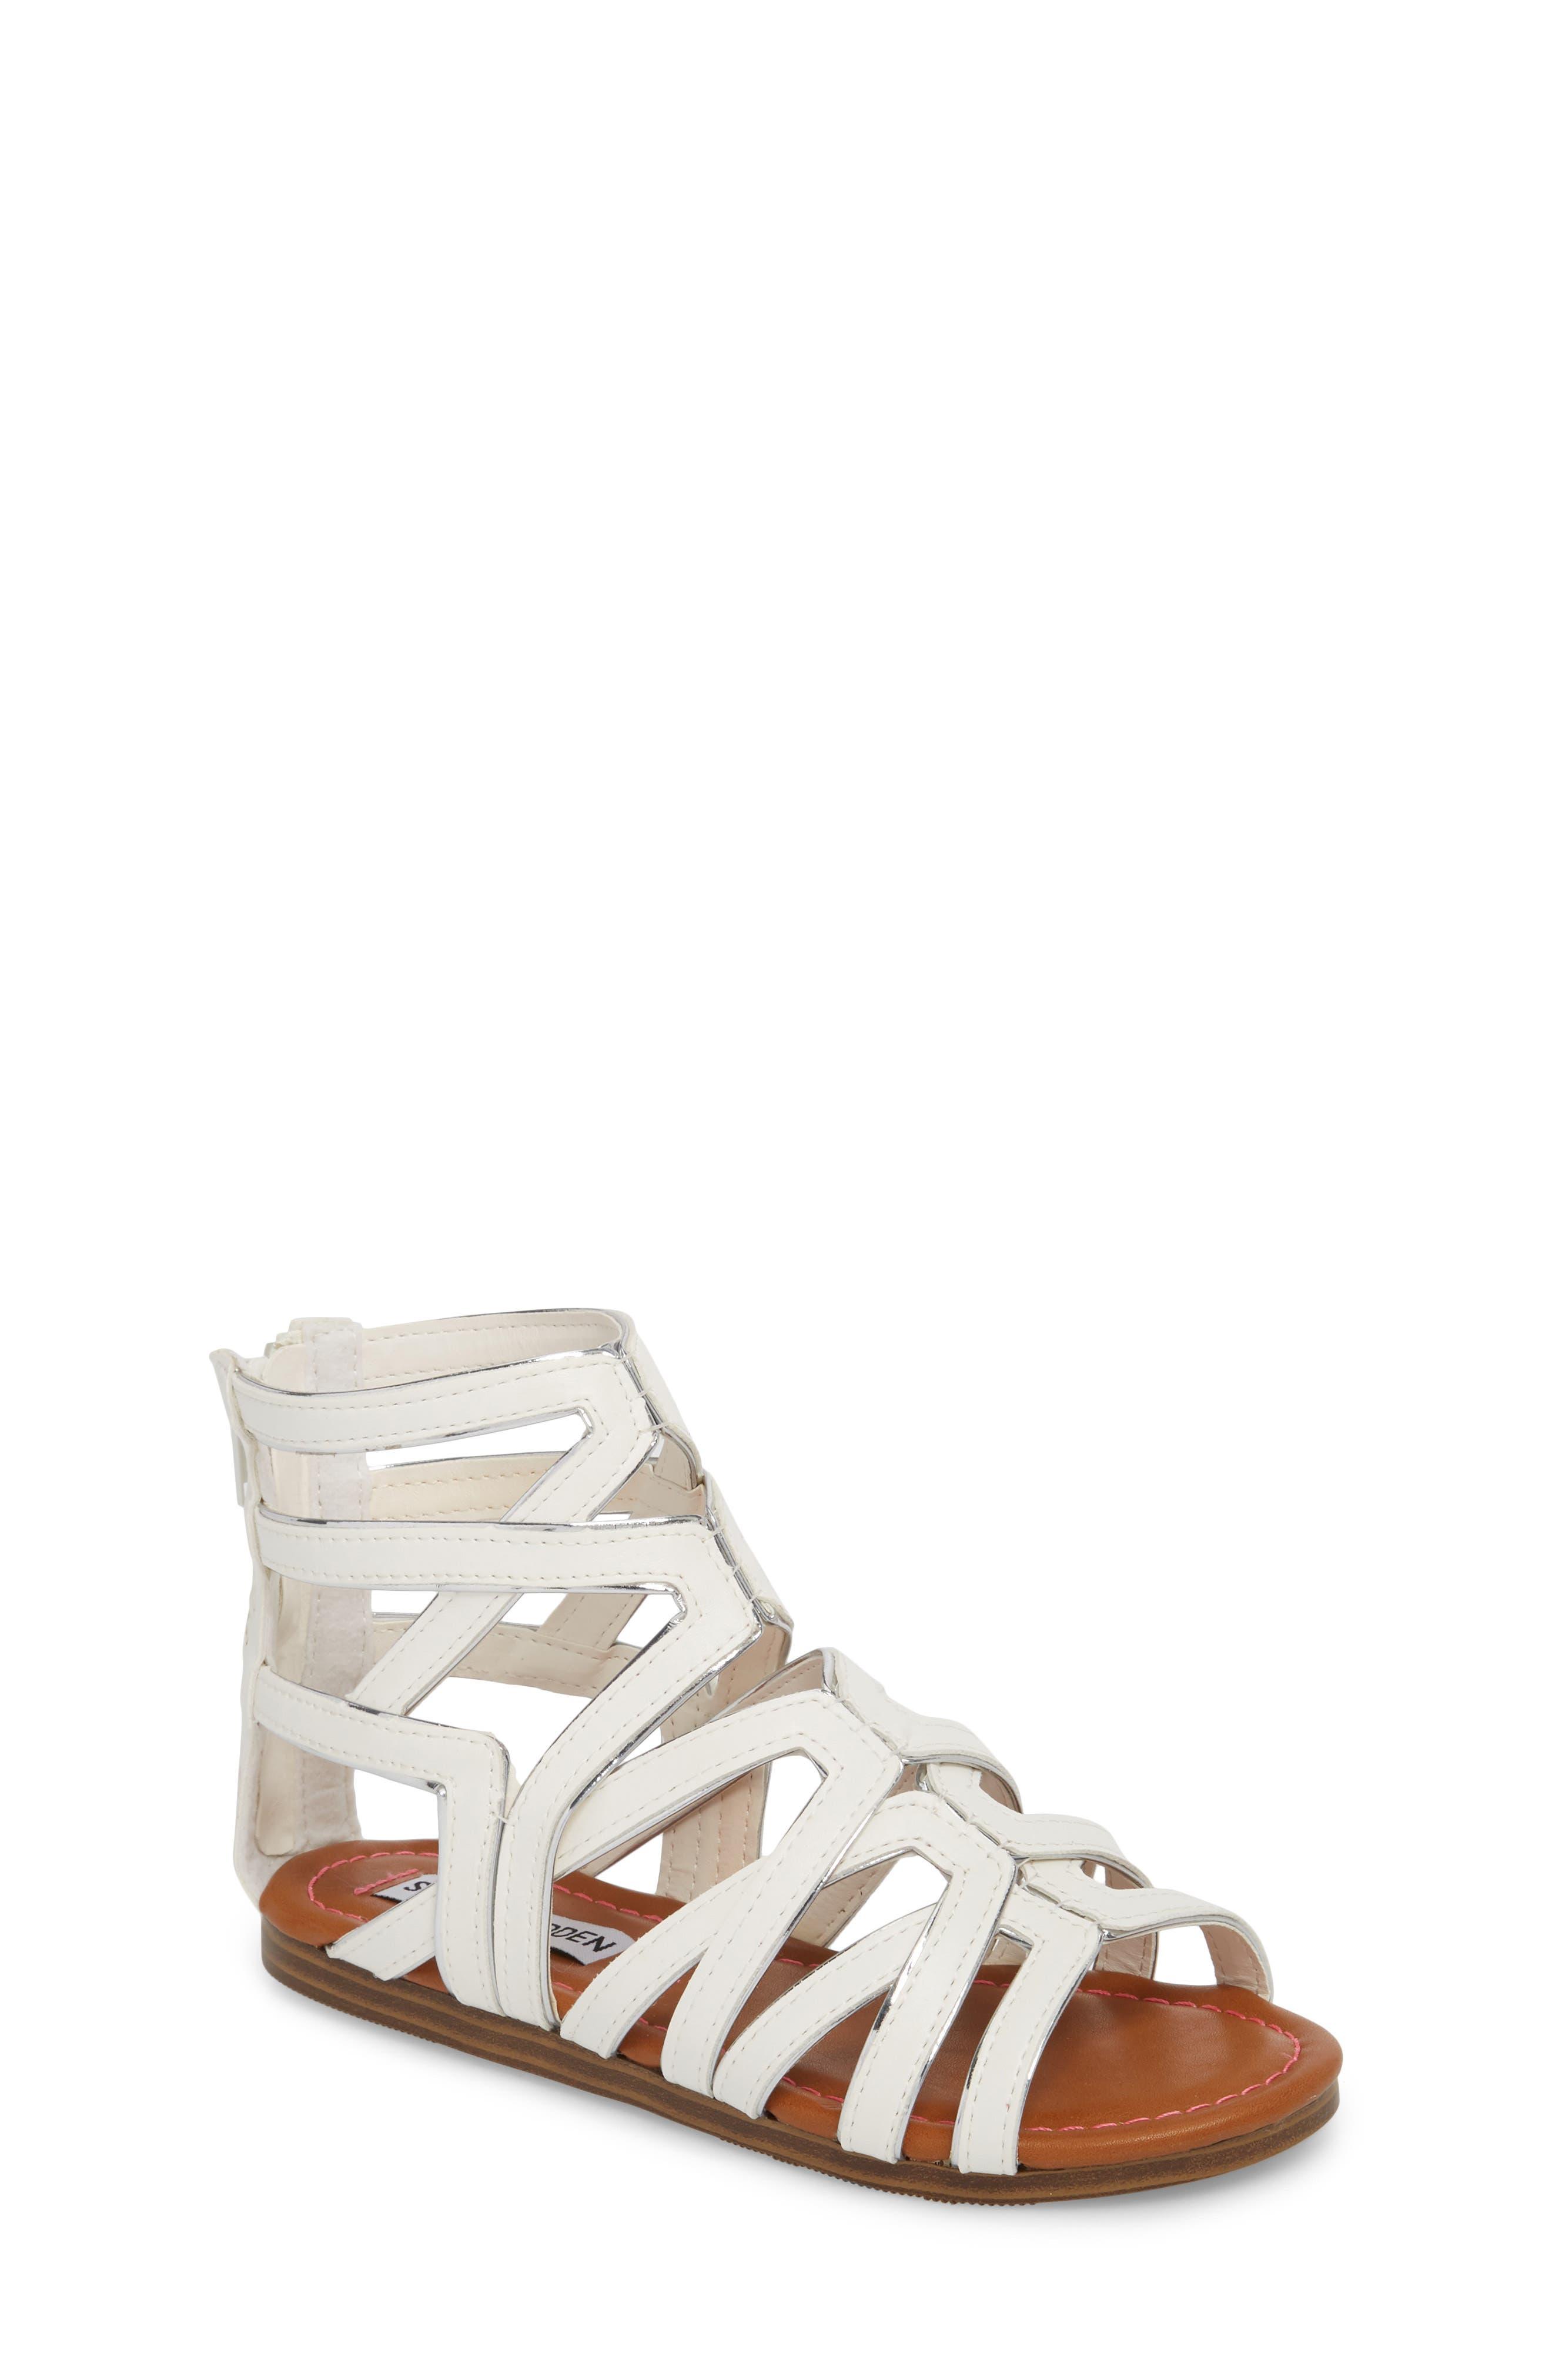 Jessence Gladiator Sandal,                         Main,                         color, White